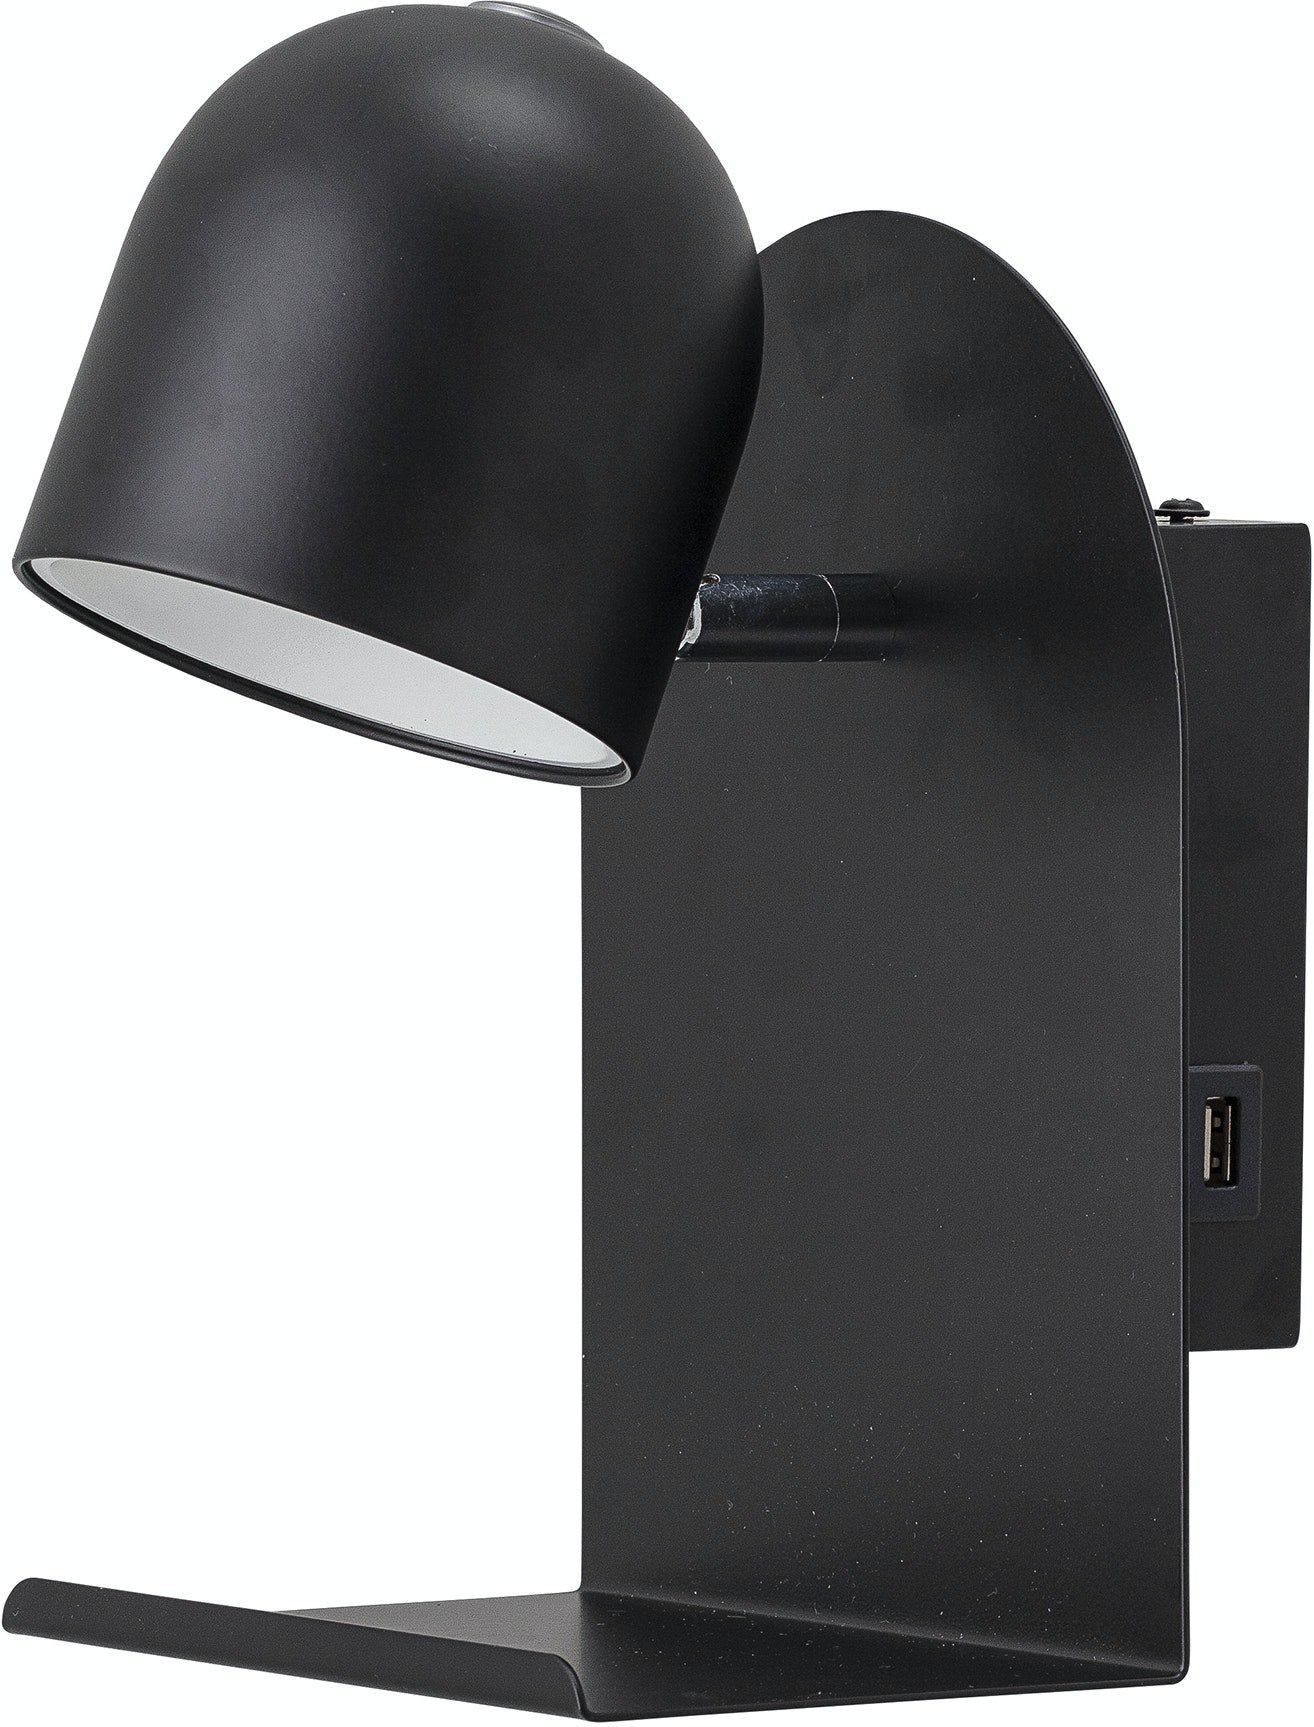 Køb Qasim, Væglampe, Sort, Metal by Bloomingville (H: 21 cm. B: 20 cm. L: 16 cm., Sort)